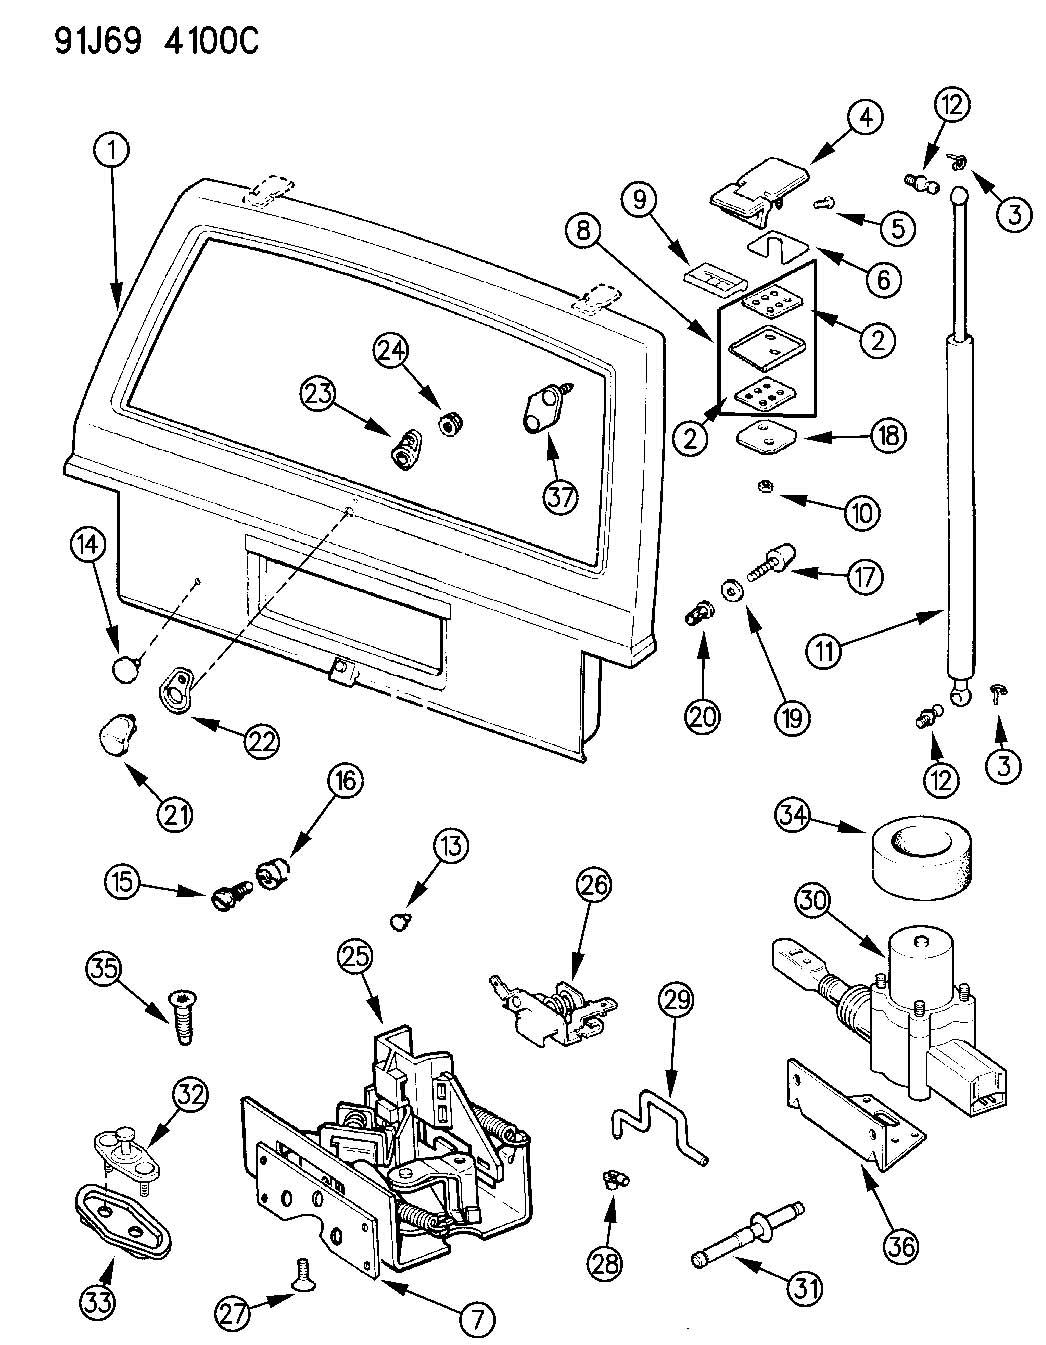 Service manual [1992 Eagle Premier Lift Gate Latch